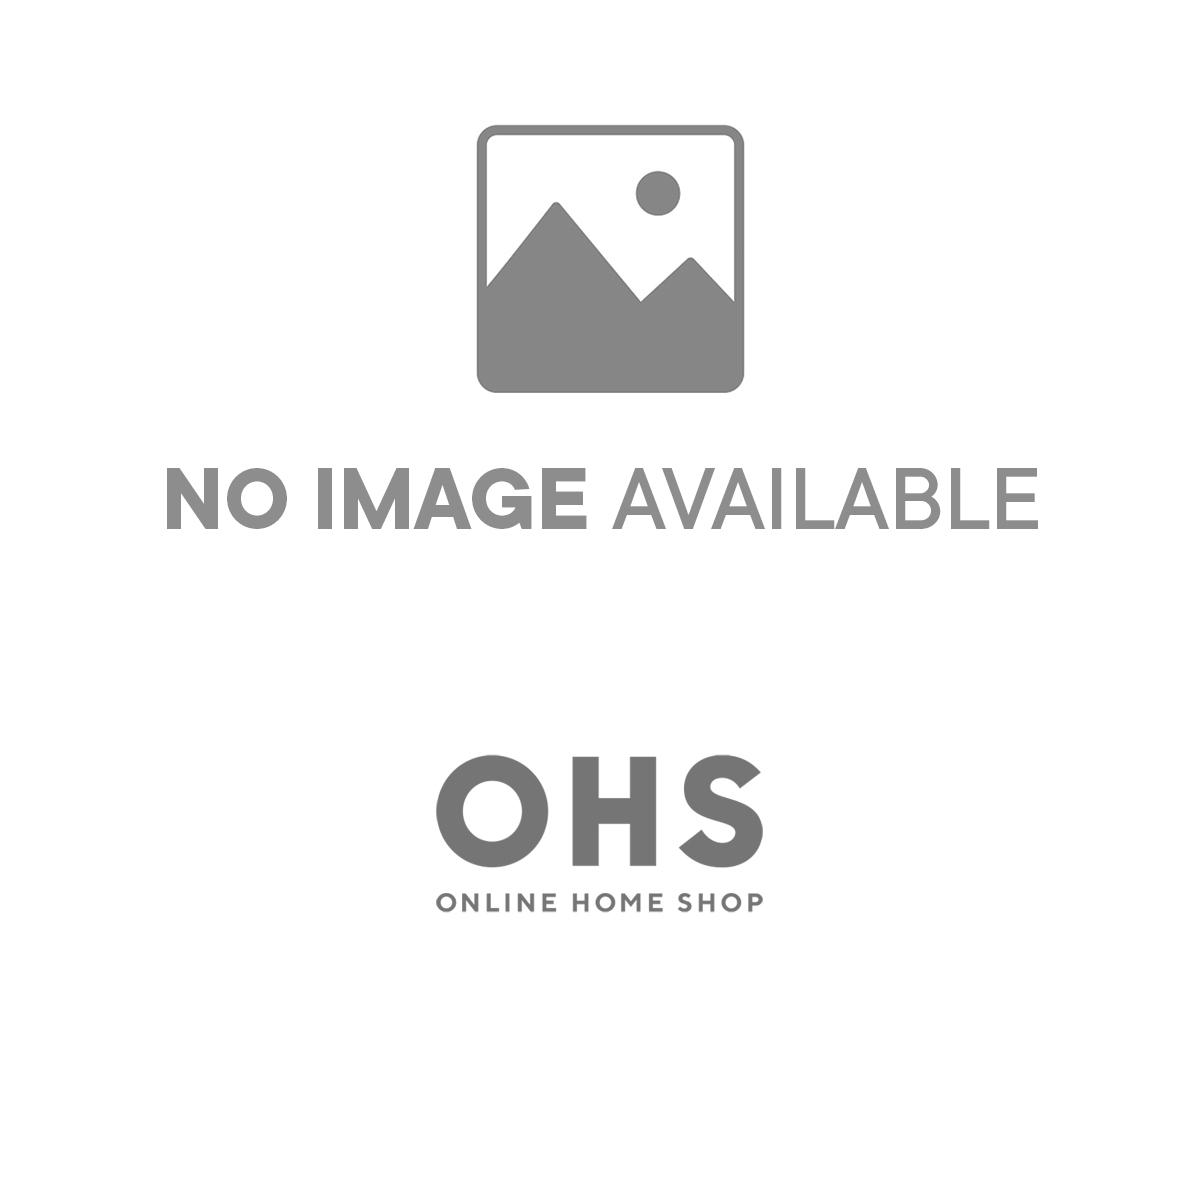 Dreamscene Towel Bale 12 Piece - Charcoal